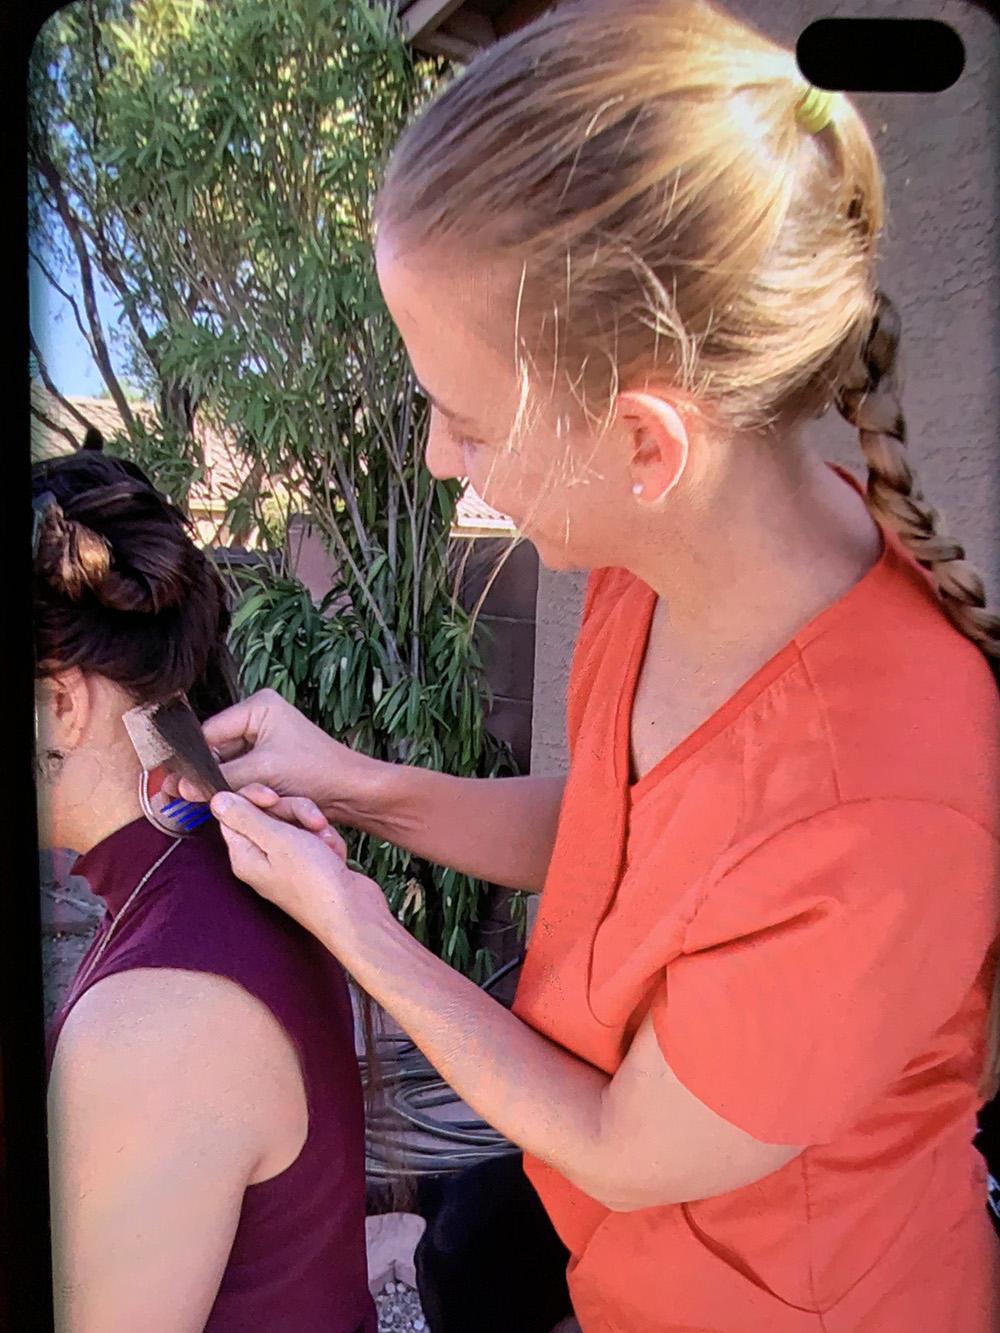 Lice_Treatment_in_Catalina_and_Casas_Adobes,_Arizona